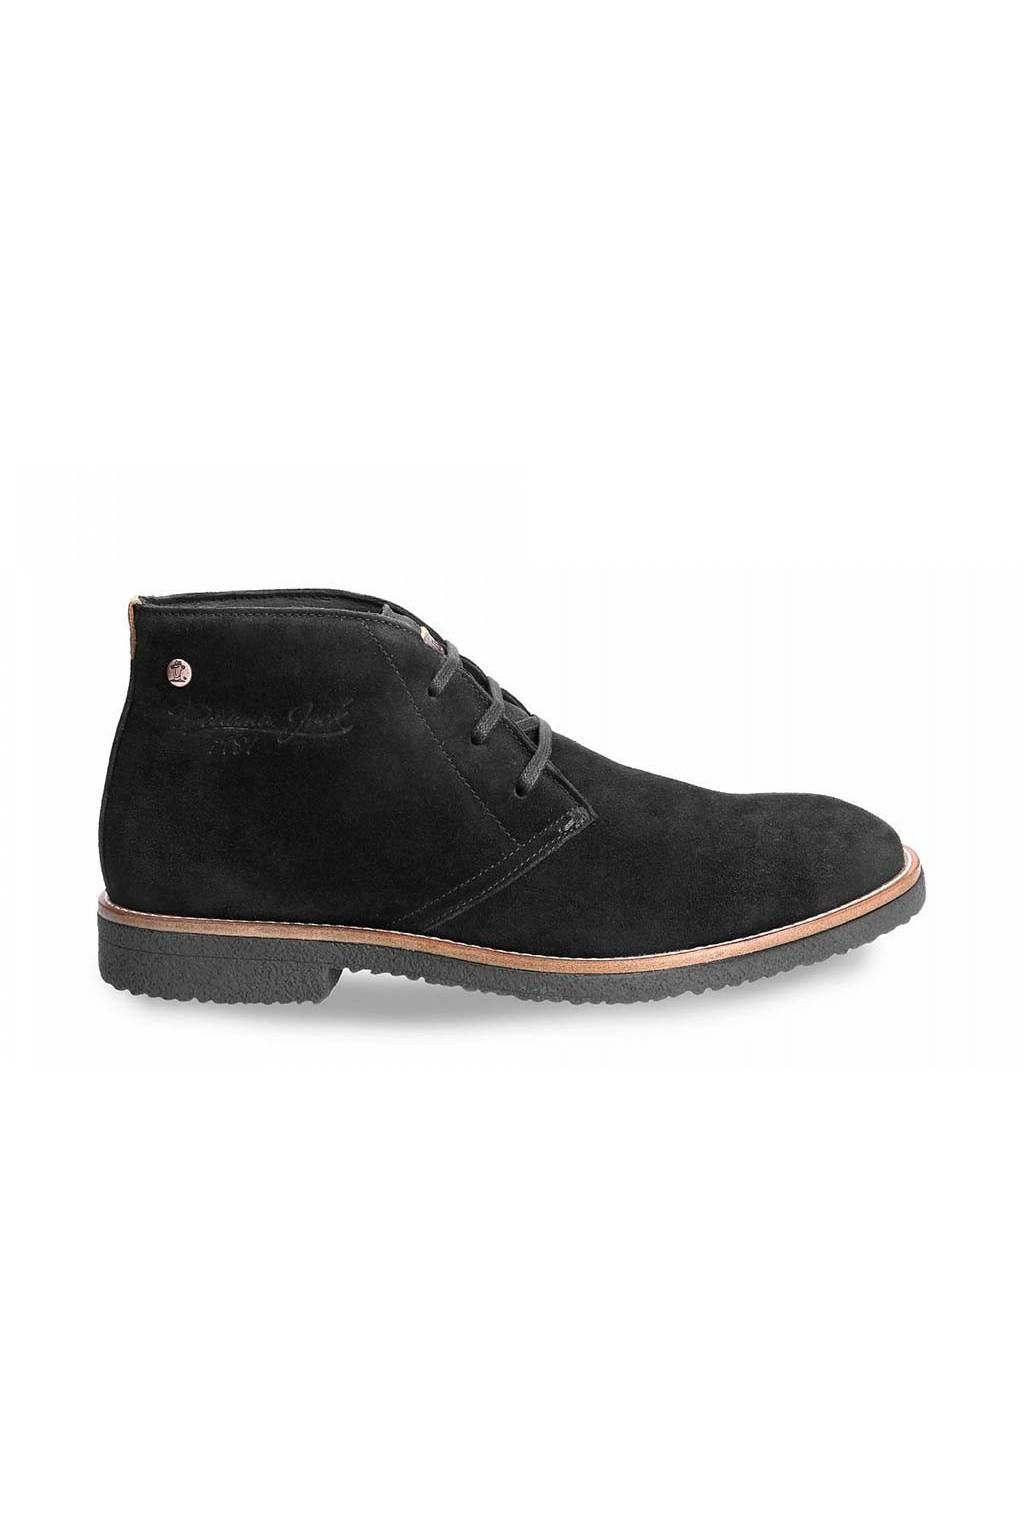 Panama Jack Gunter C15 Velour Black